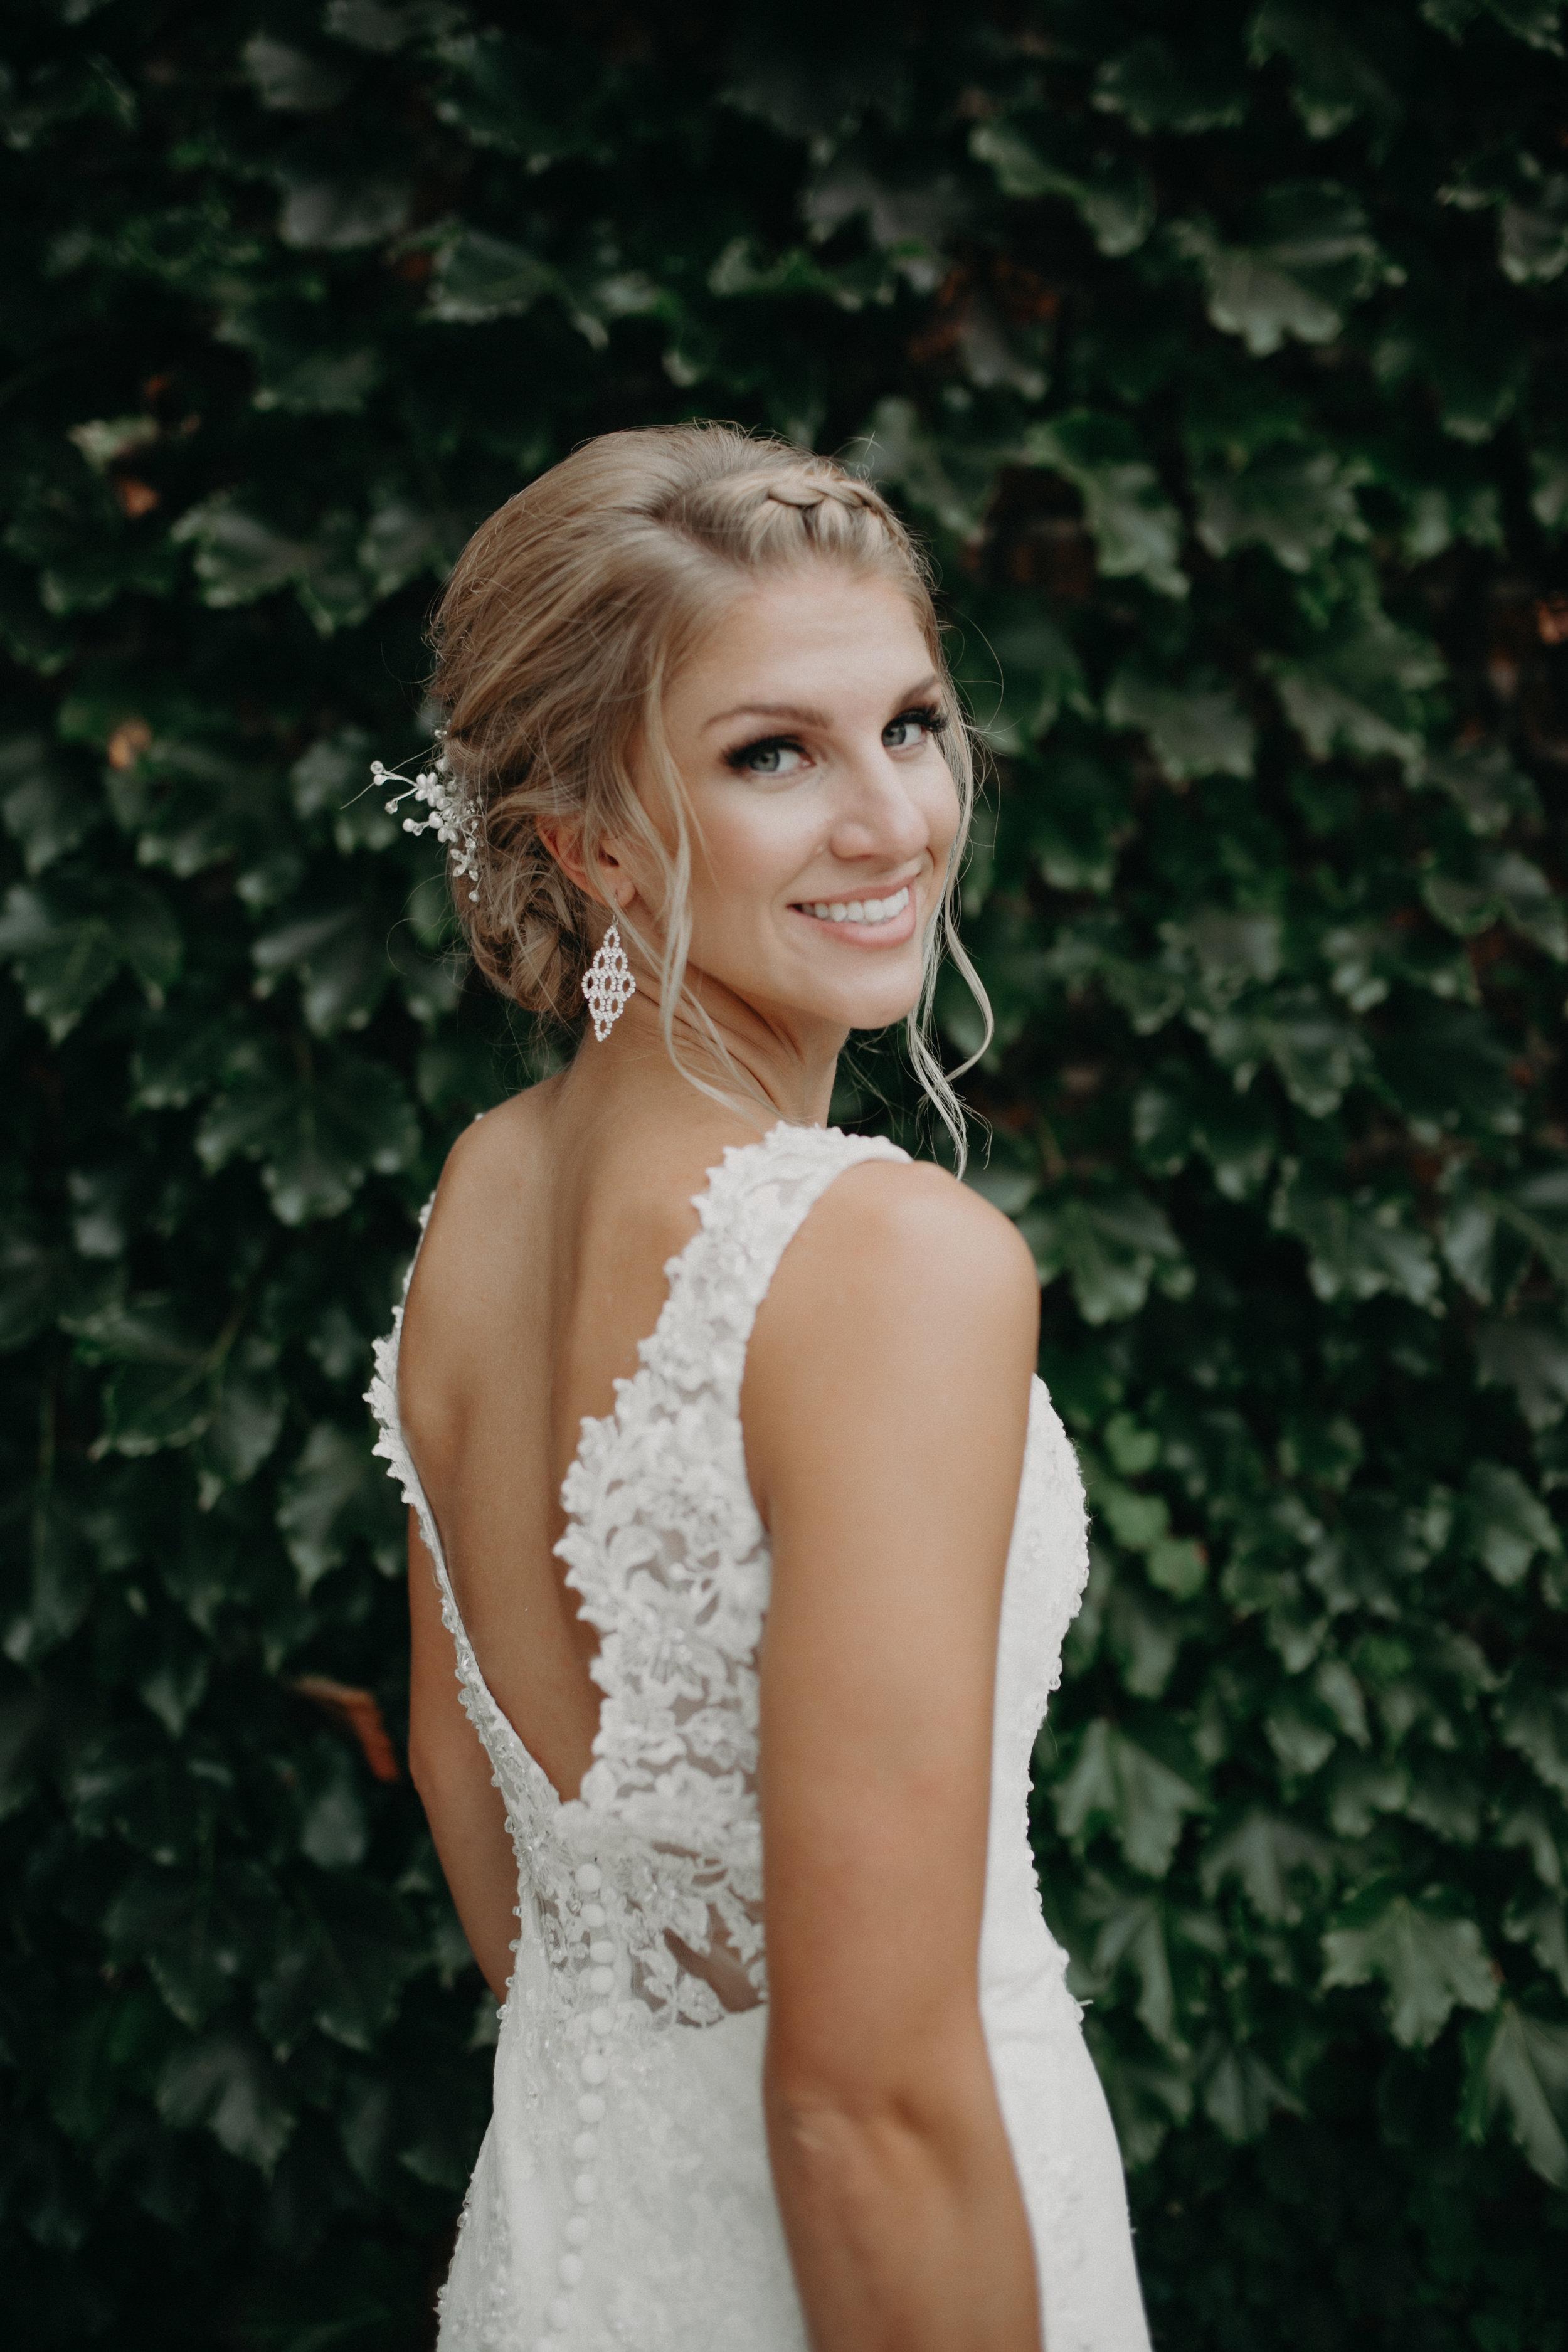 Tiffany-lenz-bride-marshfield-wi-photographer